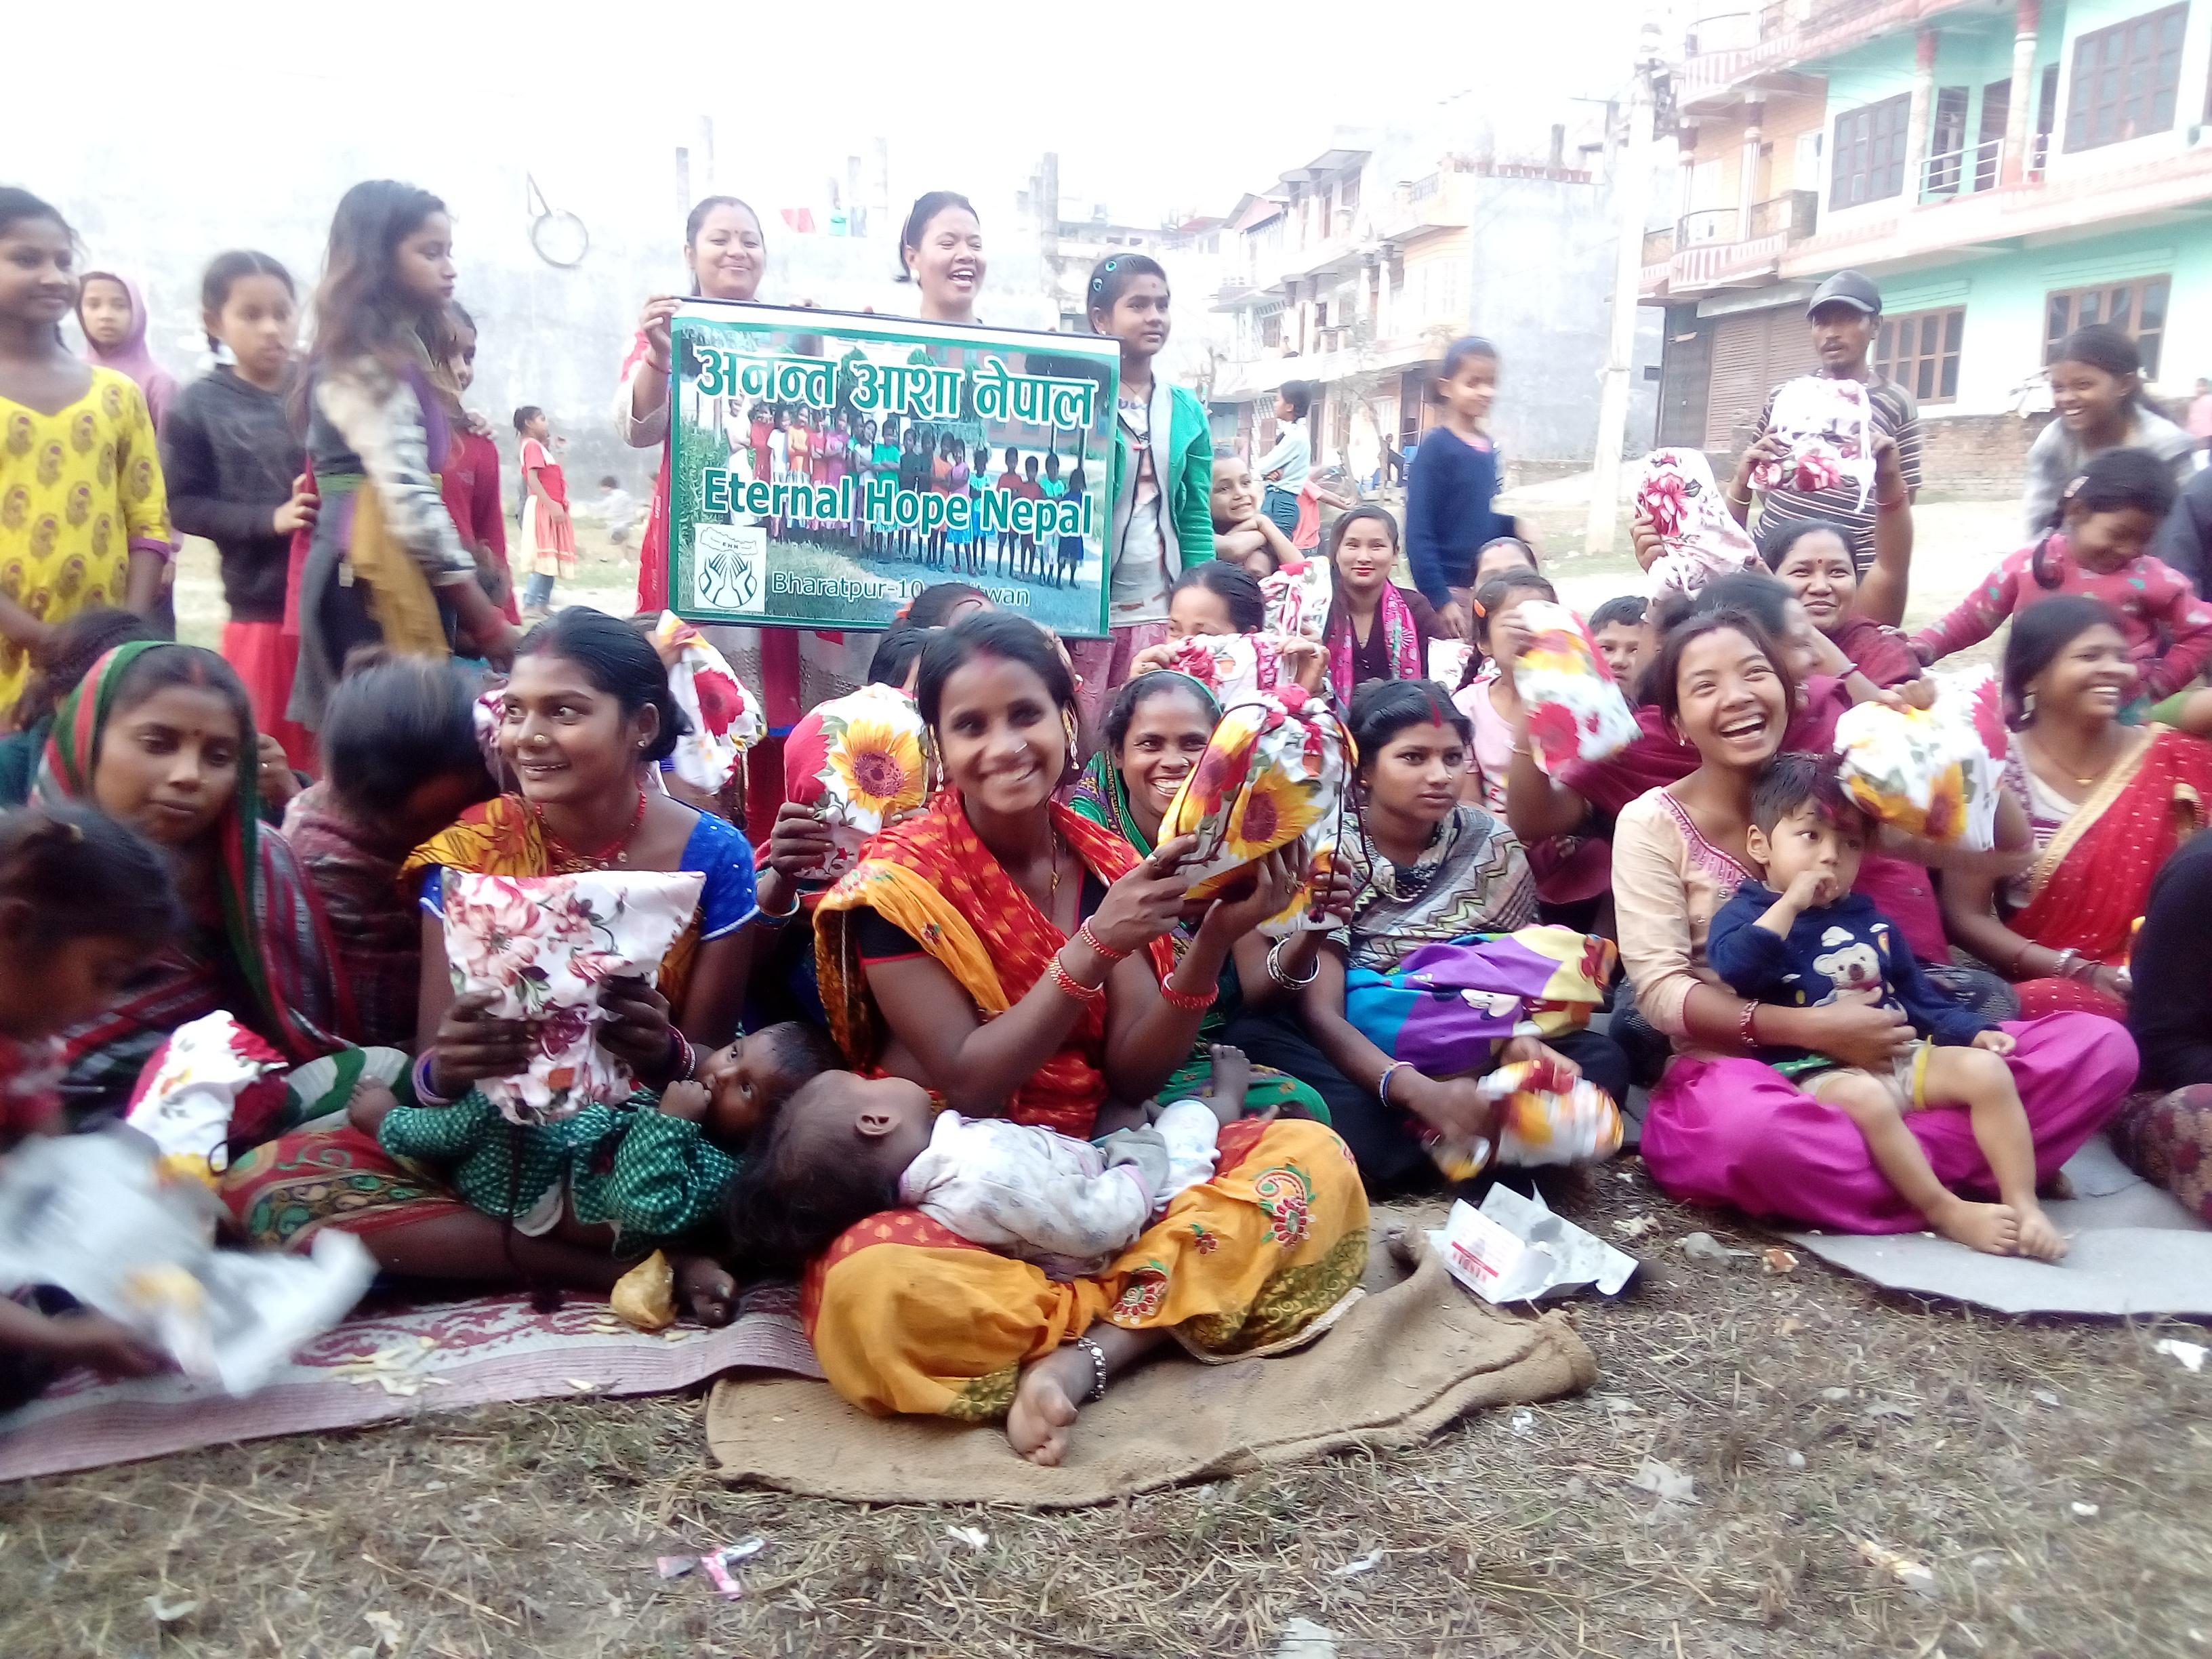 Students of Eternal Hope Nepal in the slums near Chitwan, Nepal.